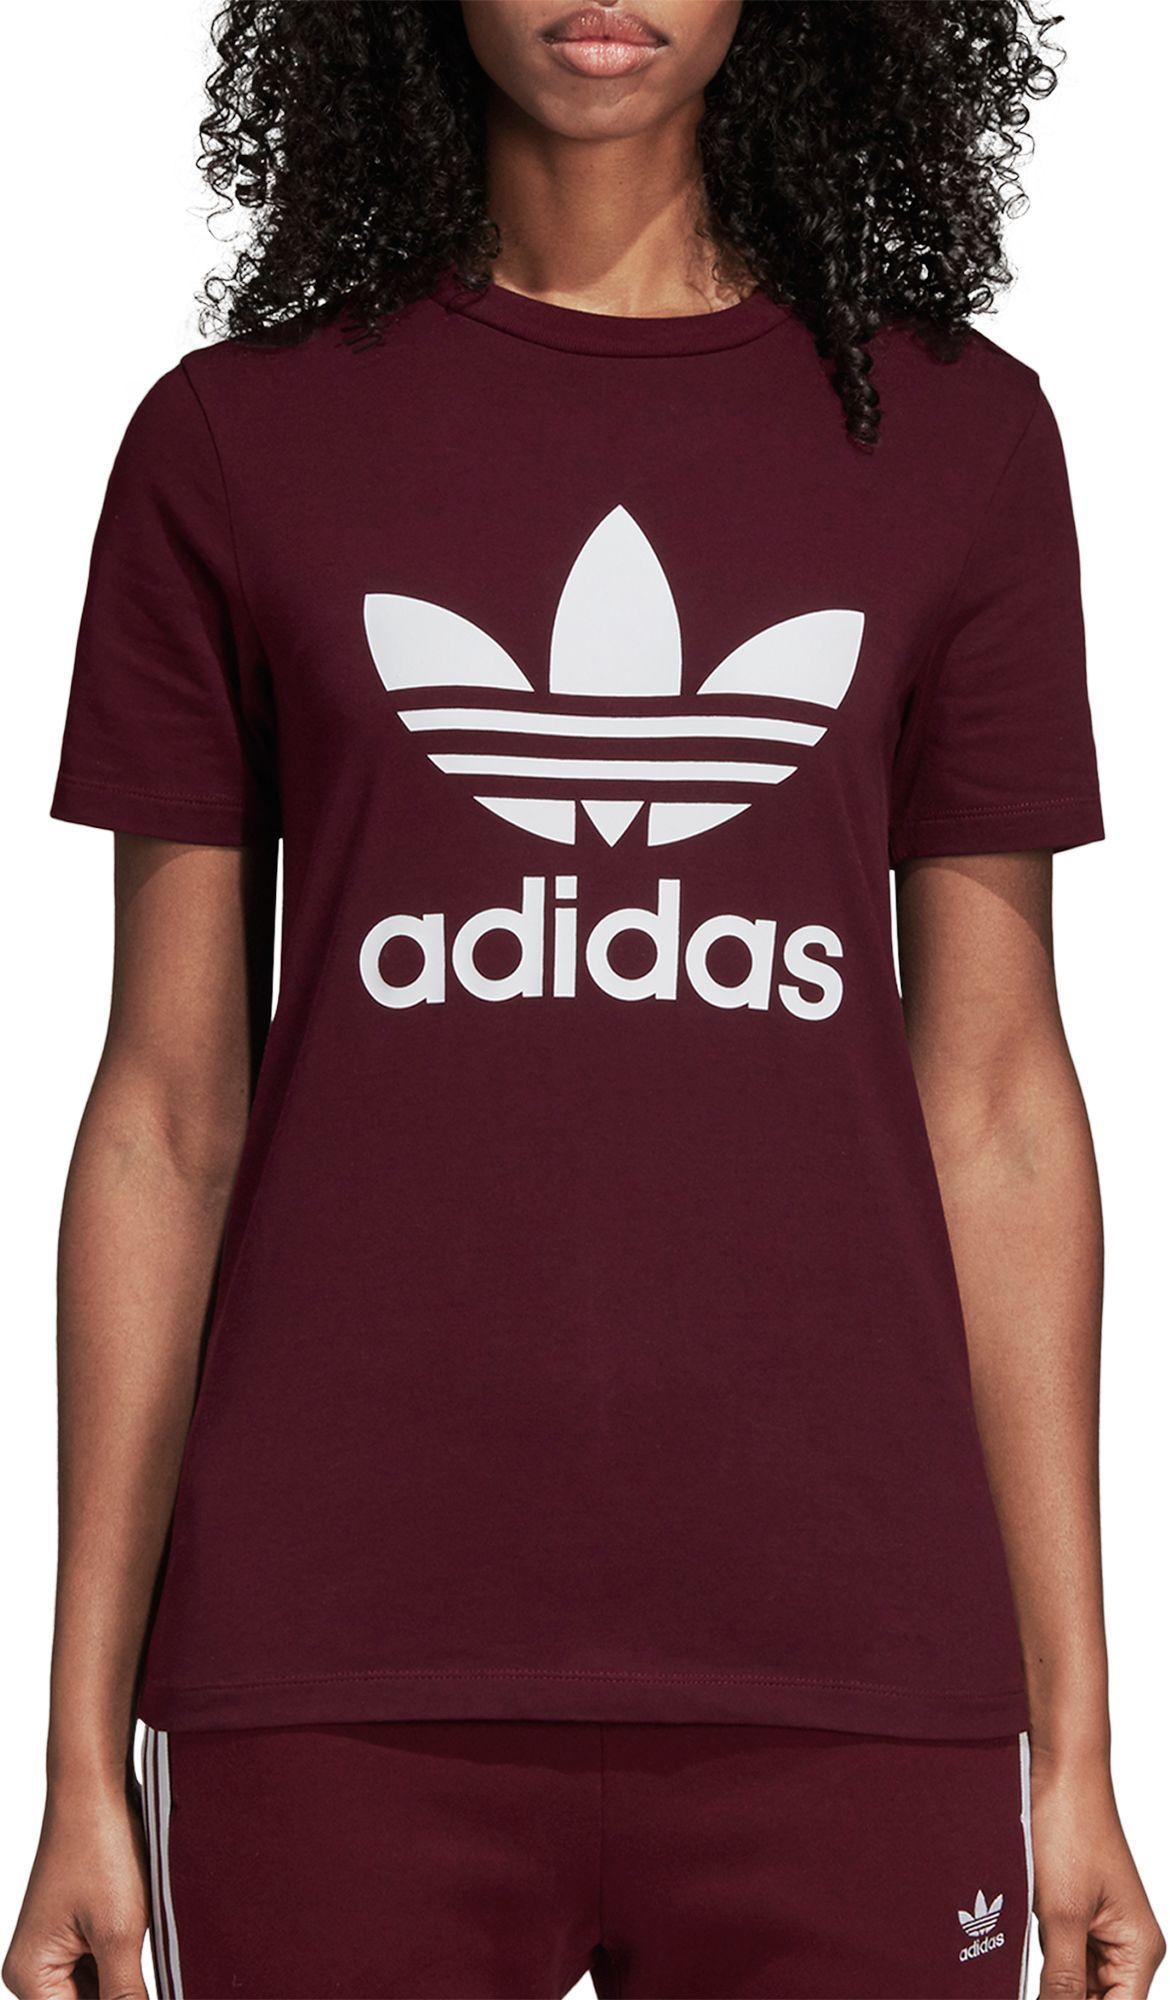 adidas Originals Women s Trefoil T-Shirt  a6fefe4b791